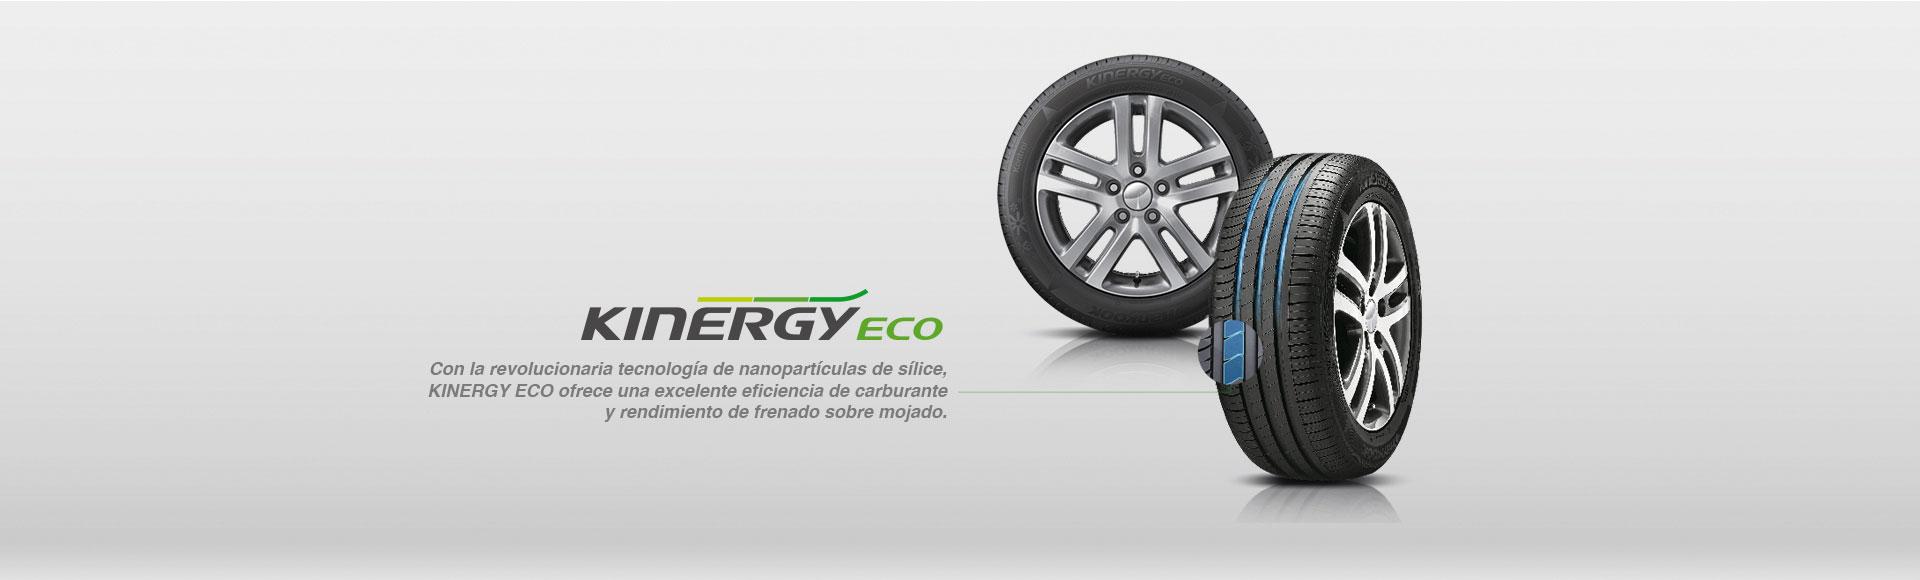 kinergy-eco